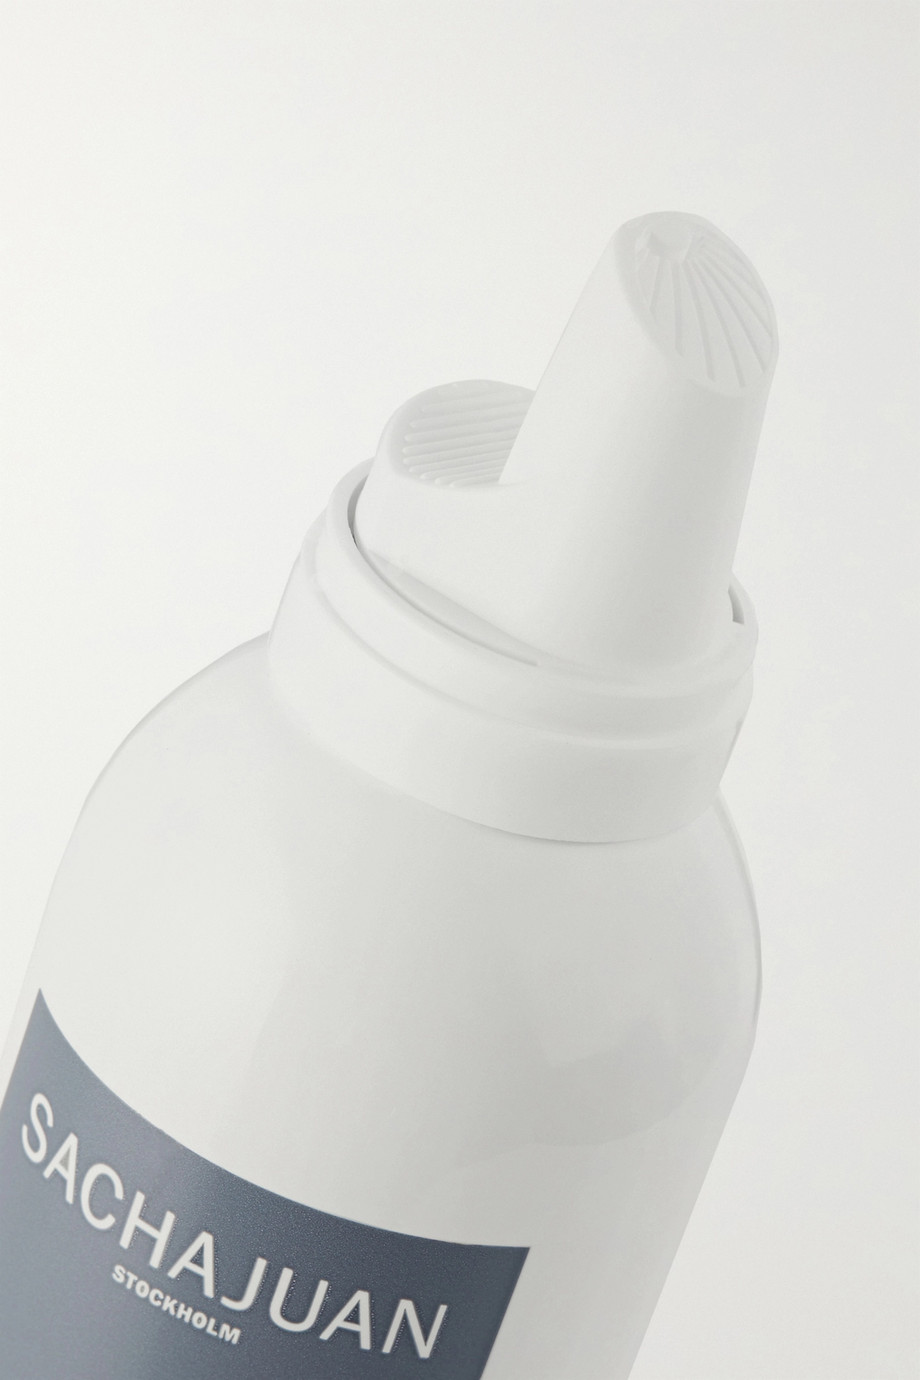 SACHAJUAN Dry Shampoo Mousse, 200 ml – Trockenshampoo